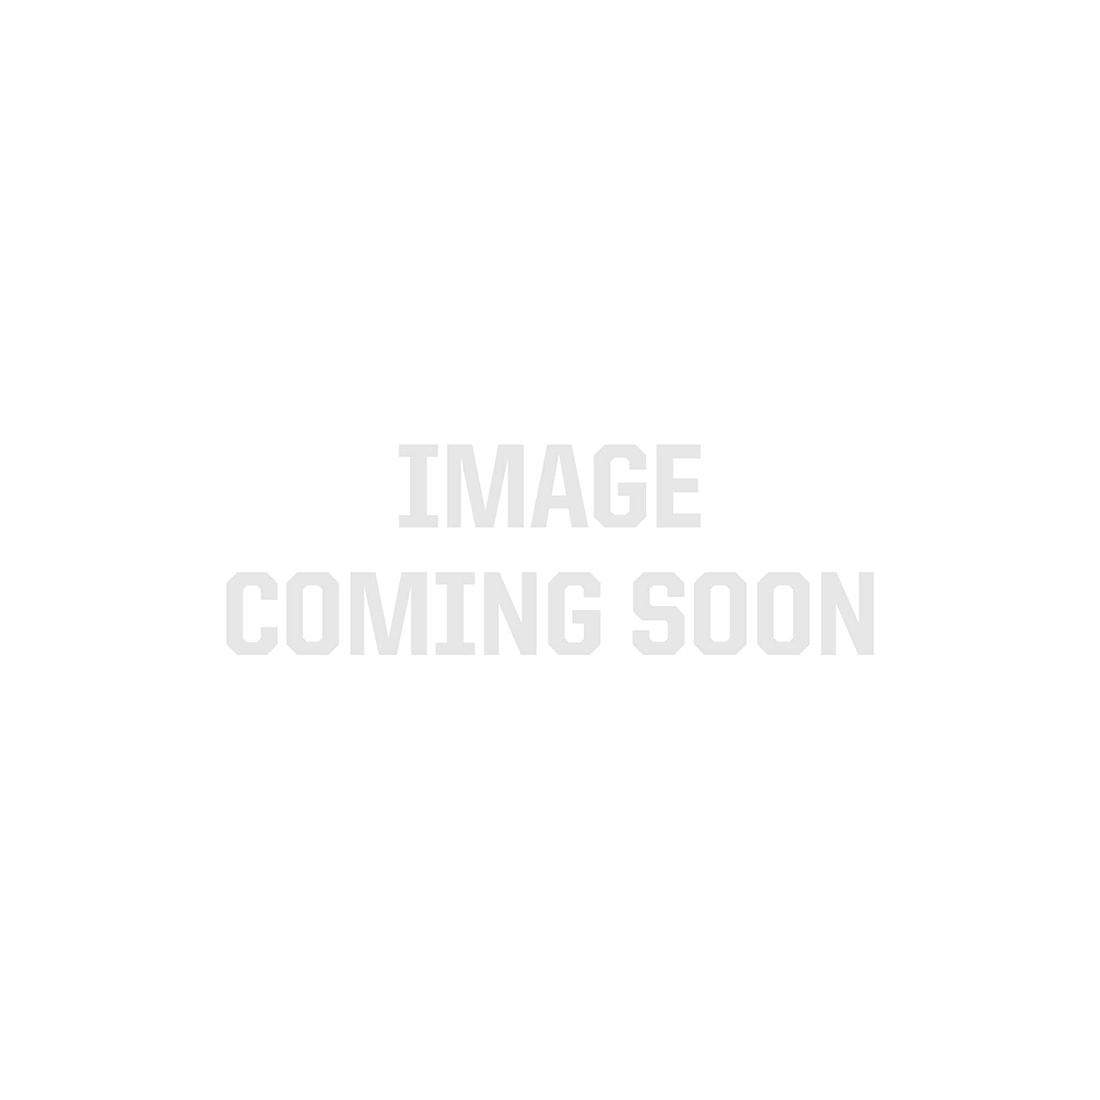 LED White Neutral 10 ÷ 15lm 3528 PLCC 2 SMD 3900-4250K 80 120 ° RF wnhi 30DS-HH-F LED